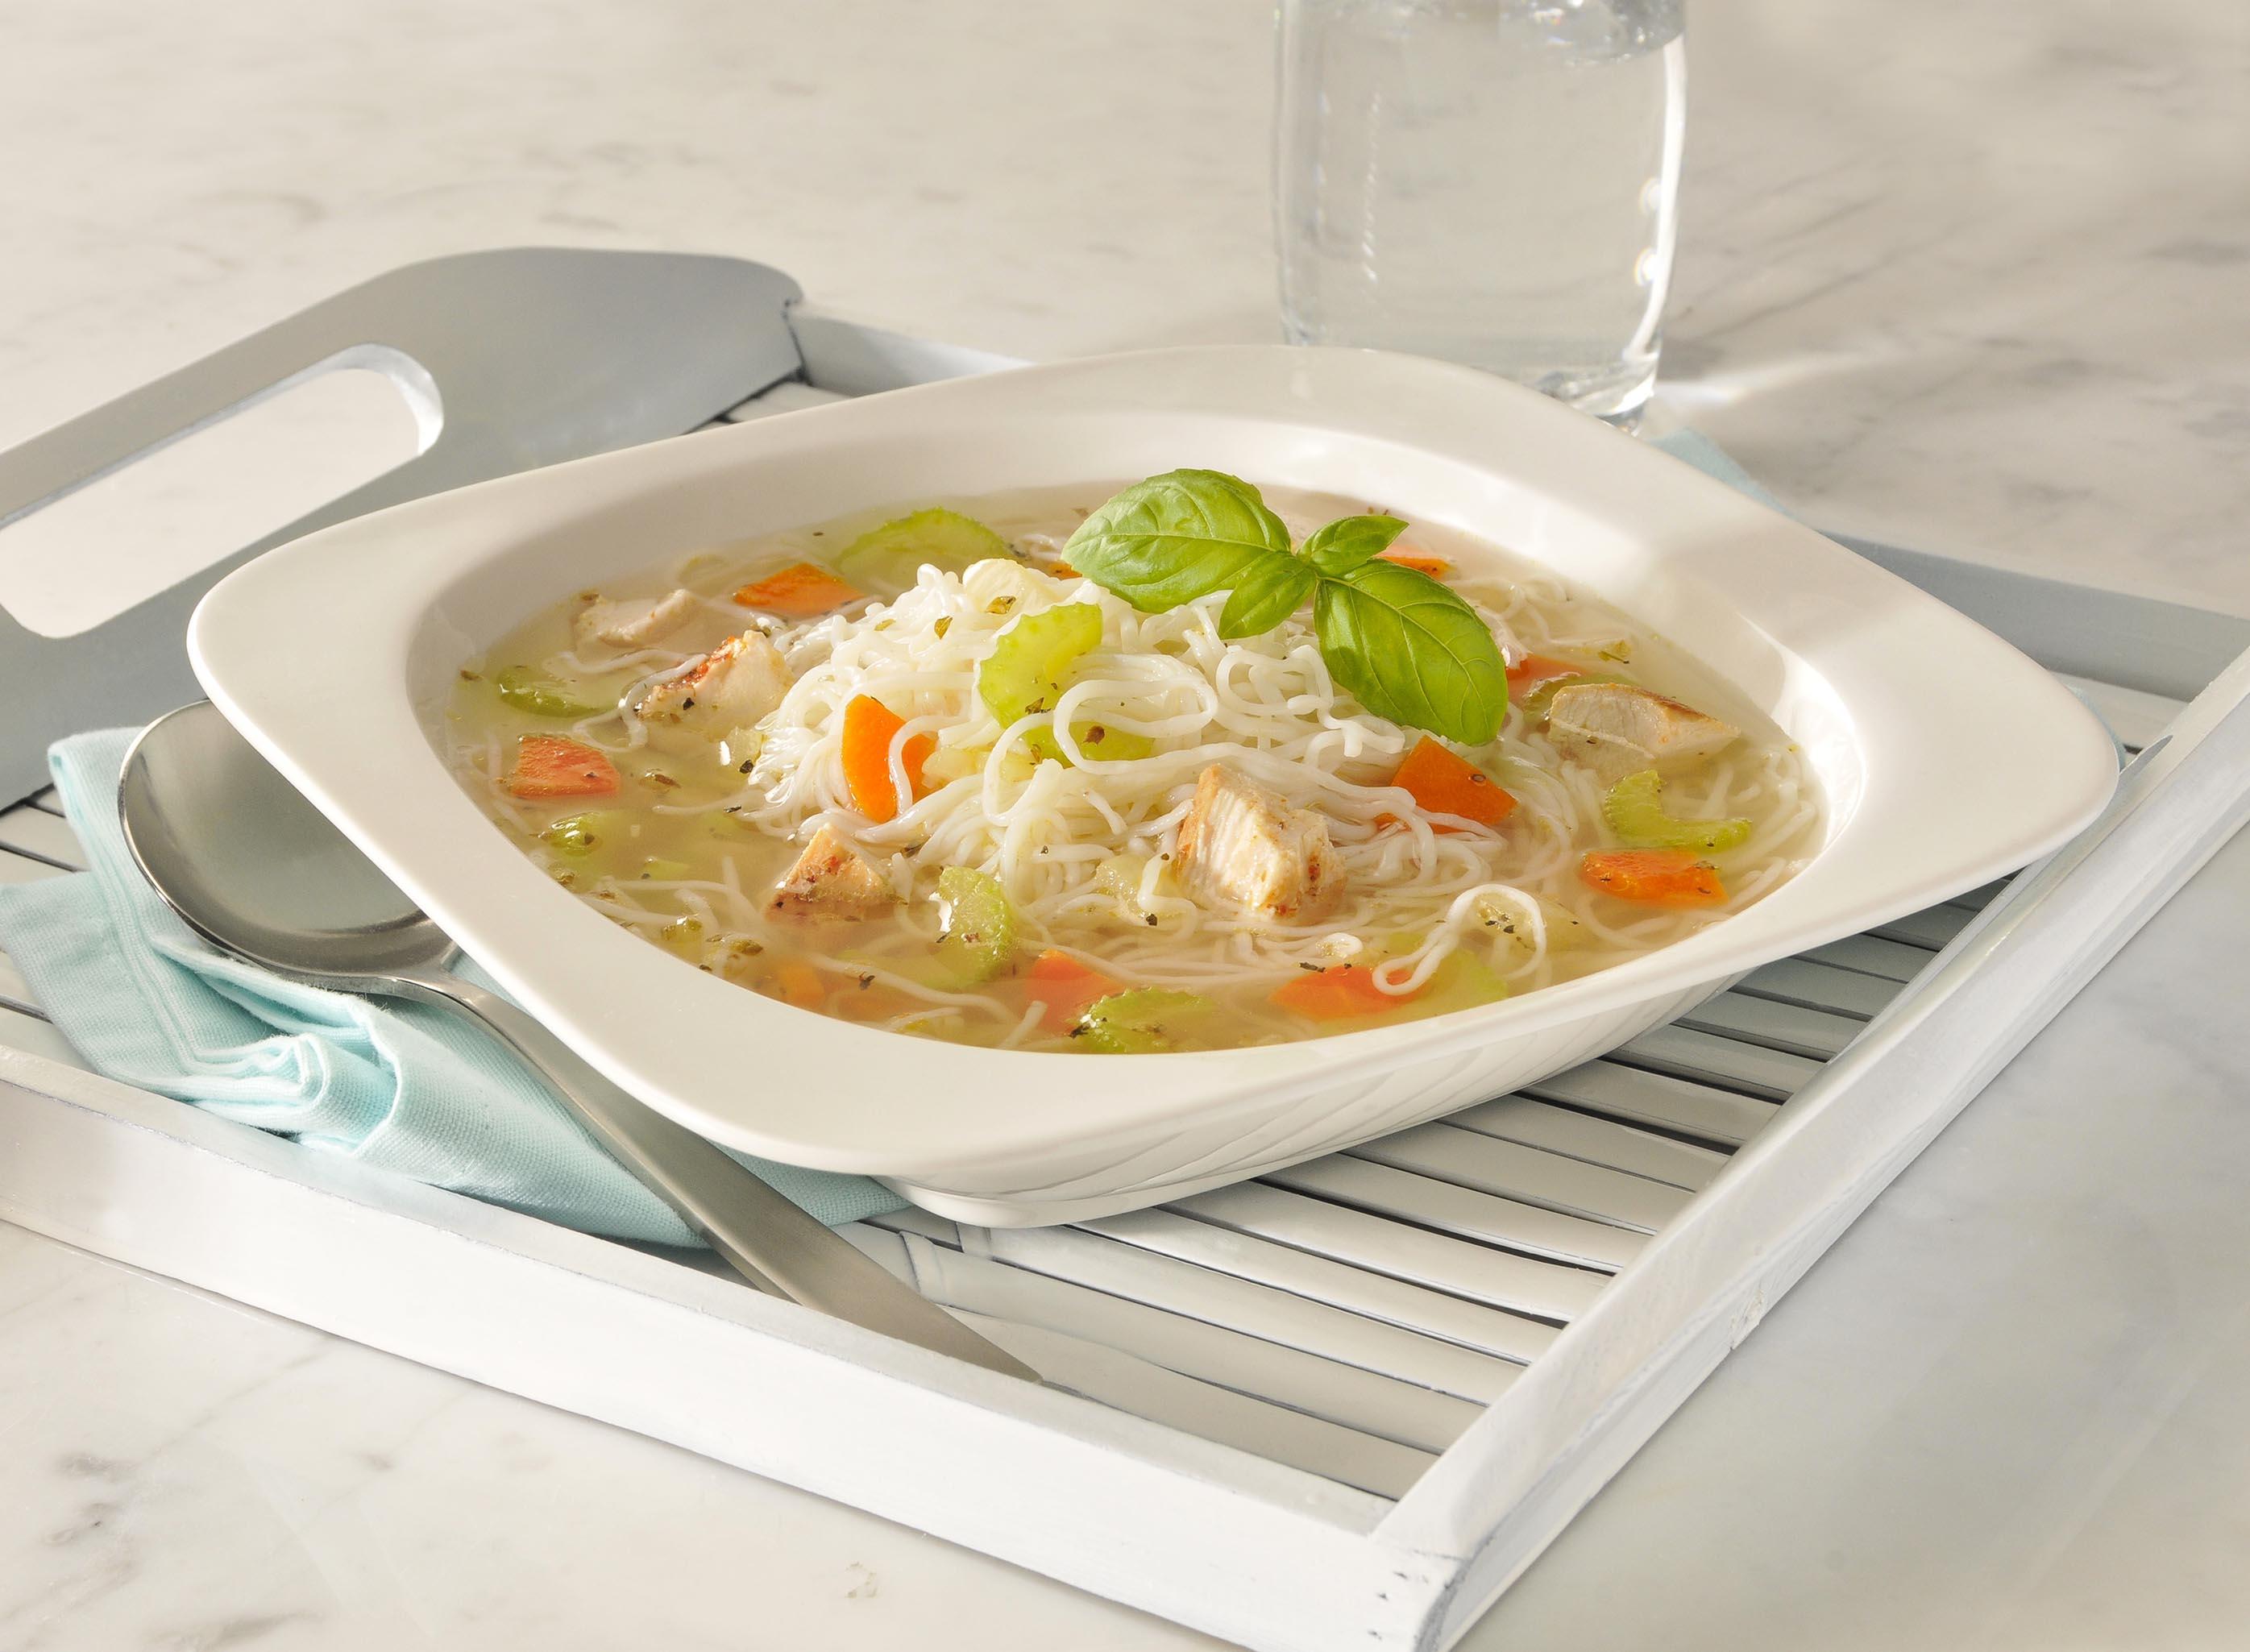 chicken-noodle-soup-recipe-nupasta-low-calorie-pasta